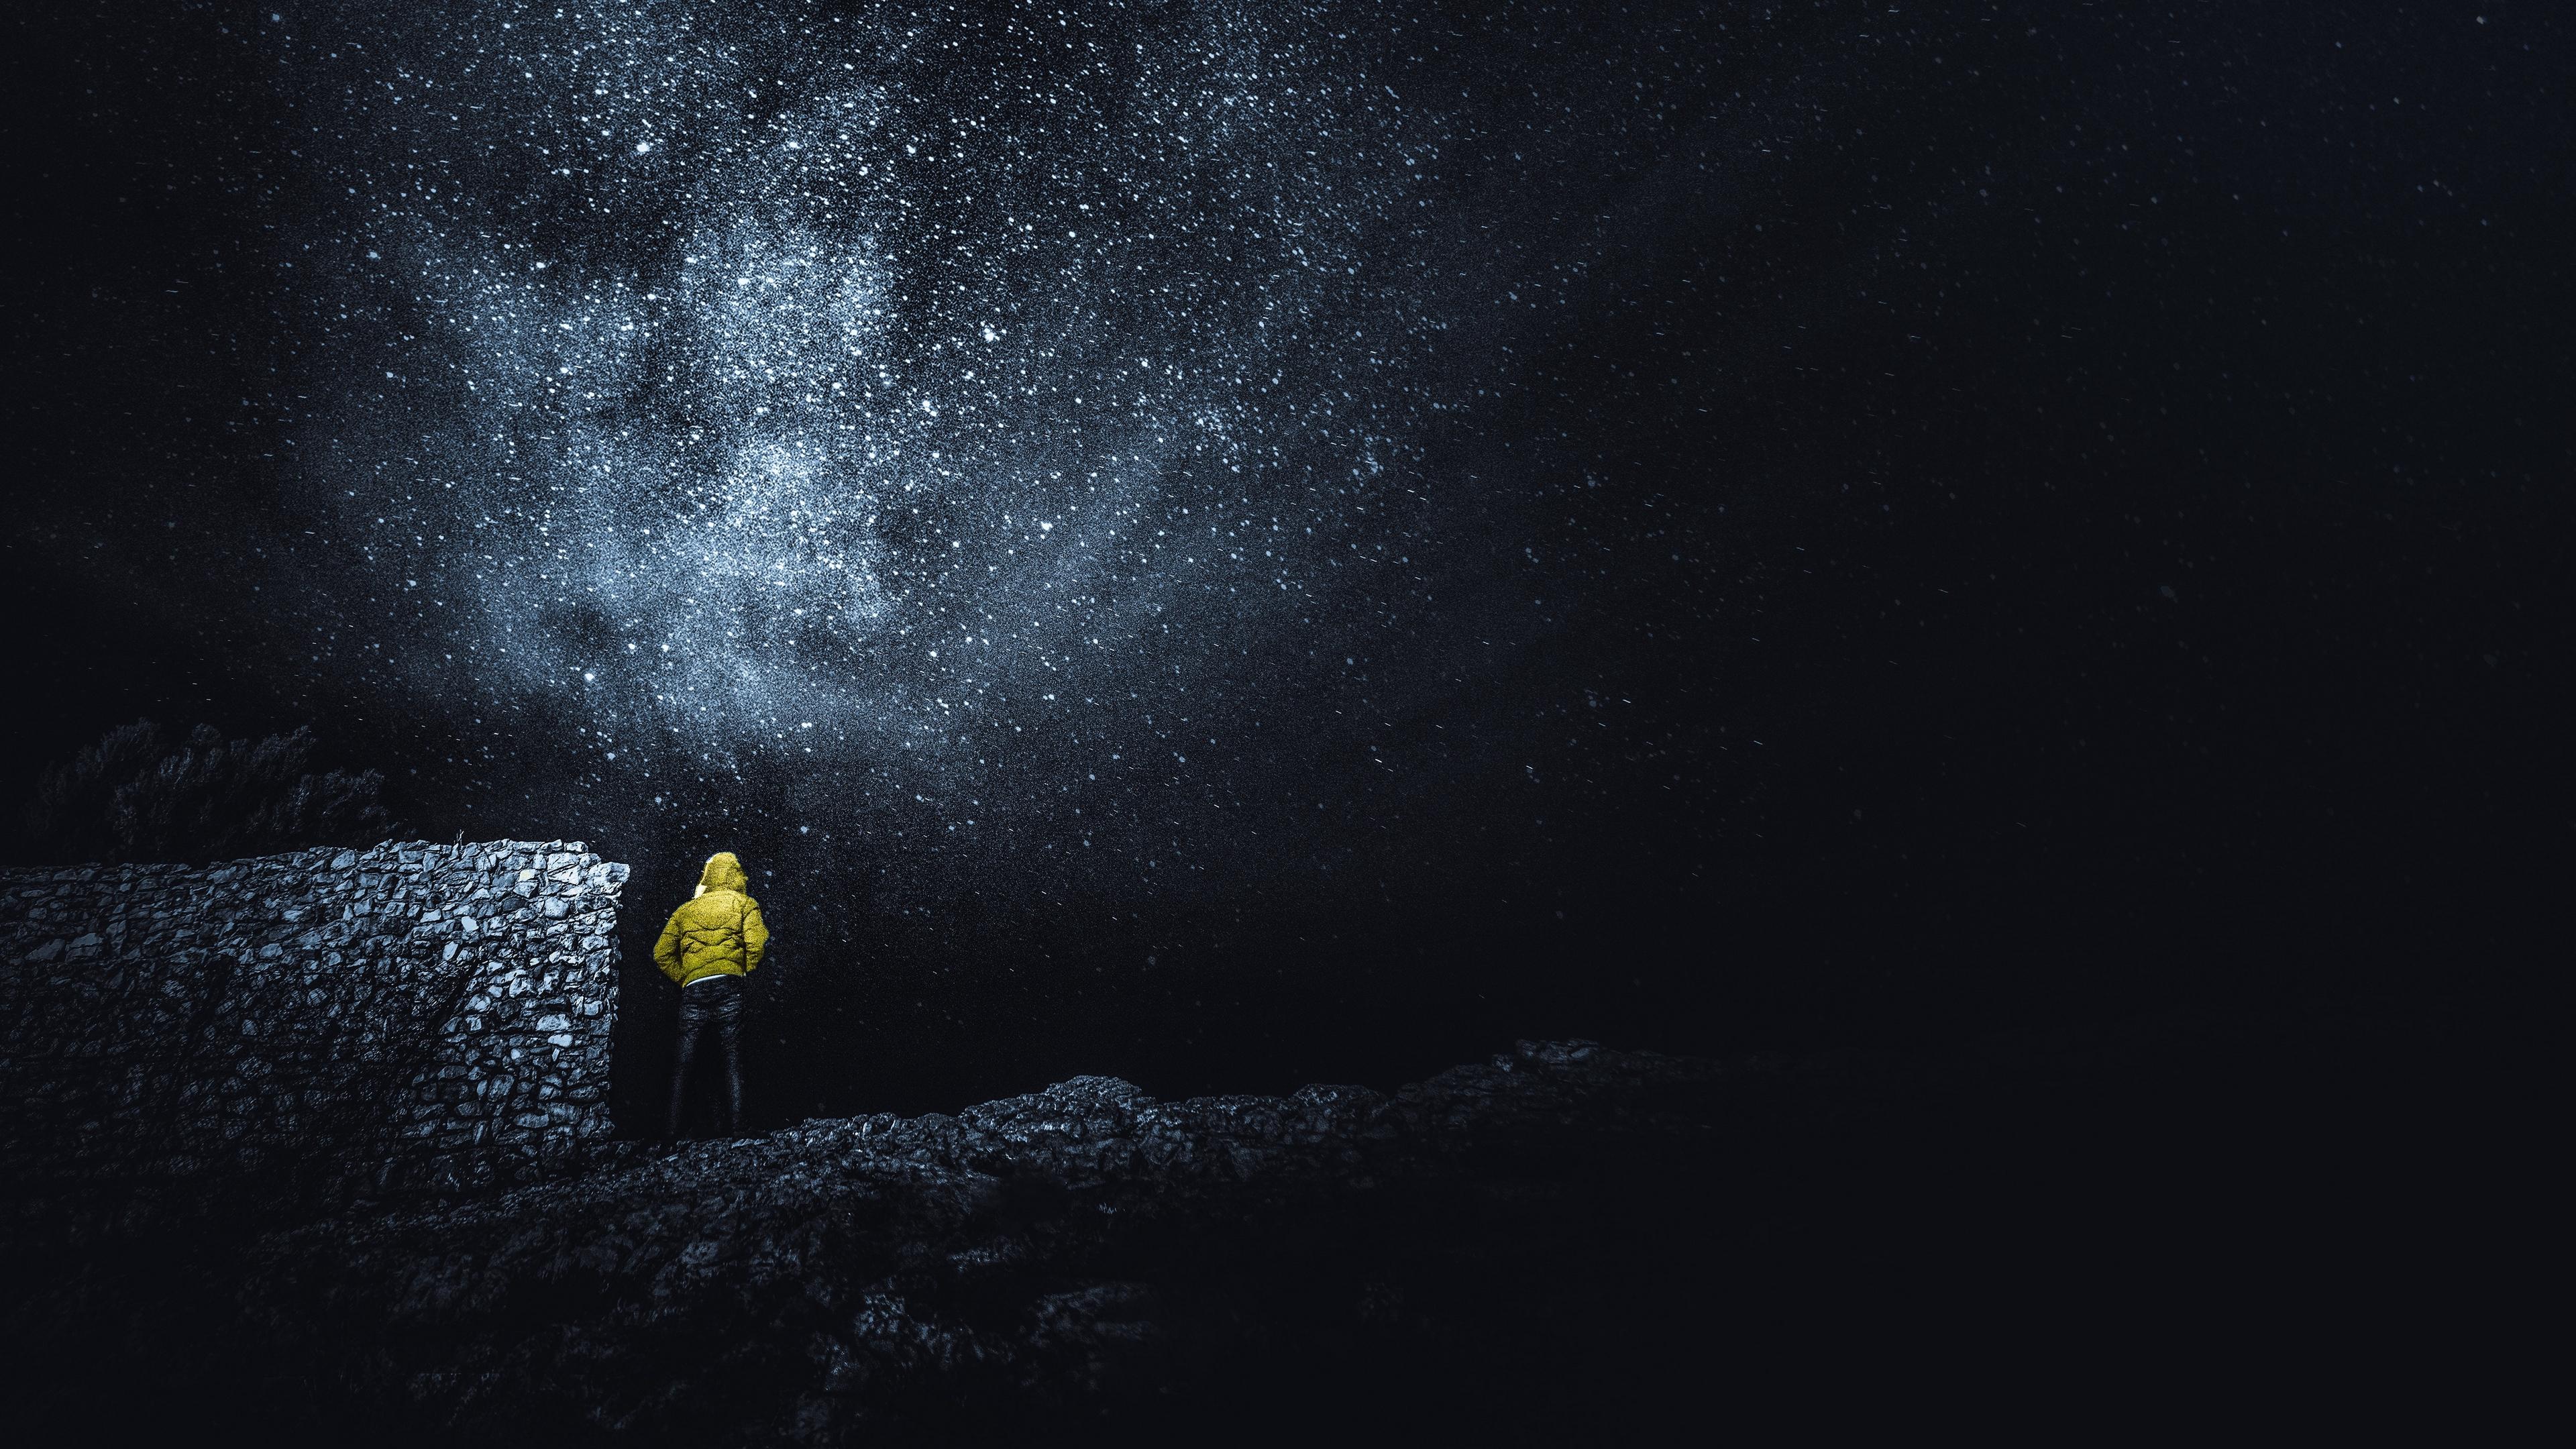 starry sky man night stars radiance sky 4k 1540575375 - starry sky, man, night, stars, radiance, sky 4k - starry sky, Night, Man